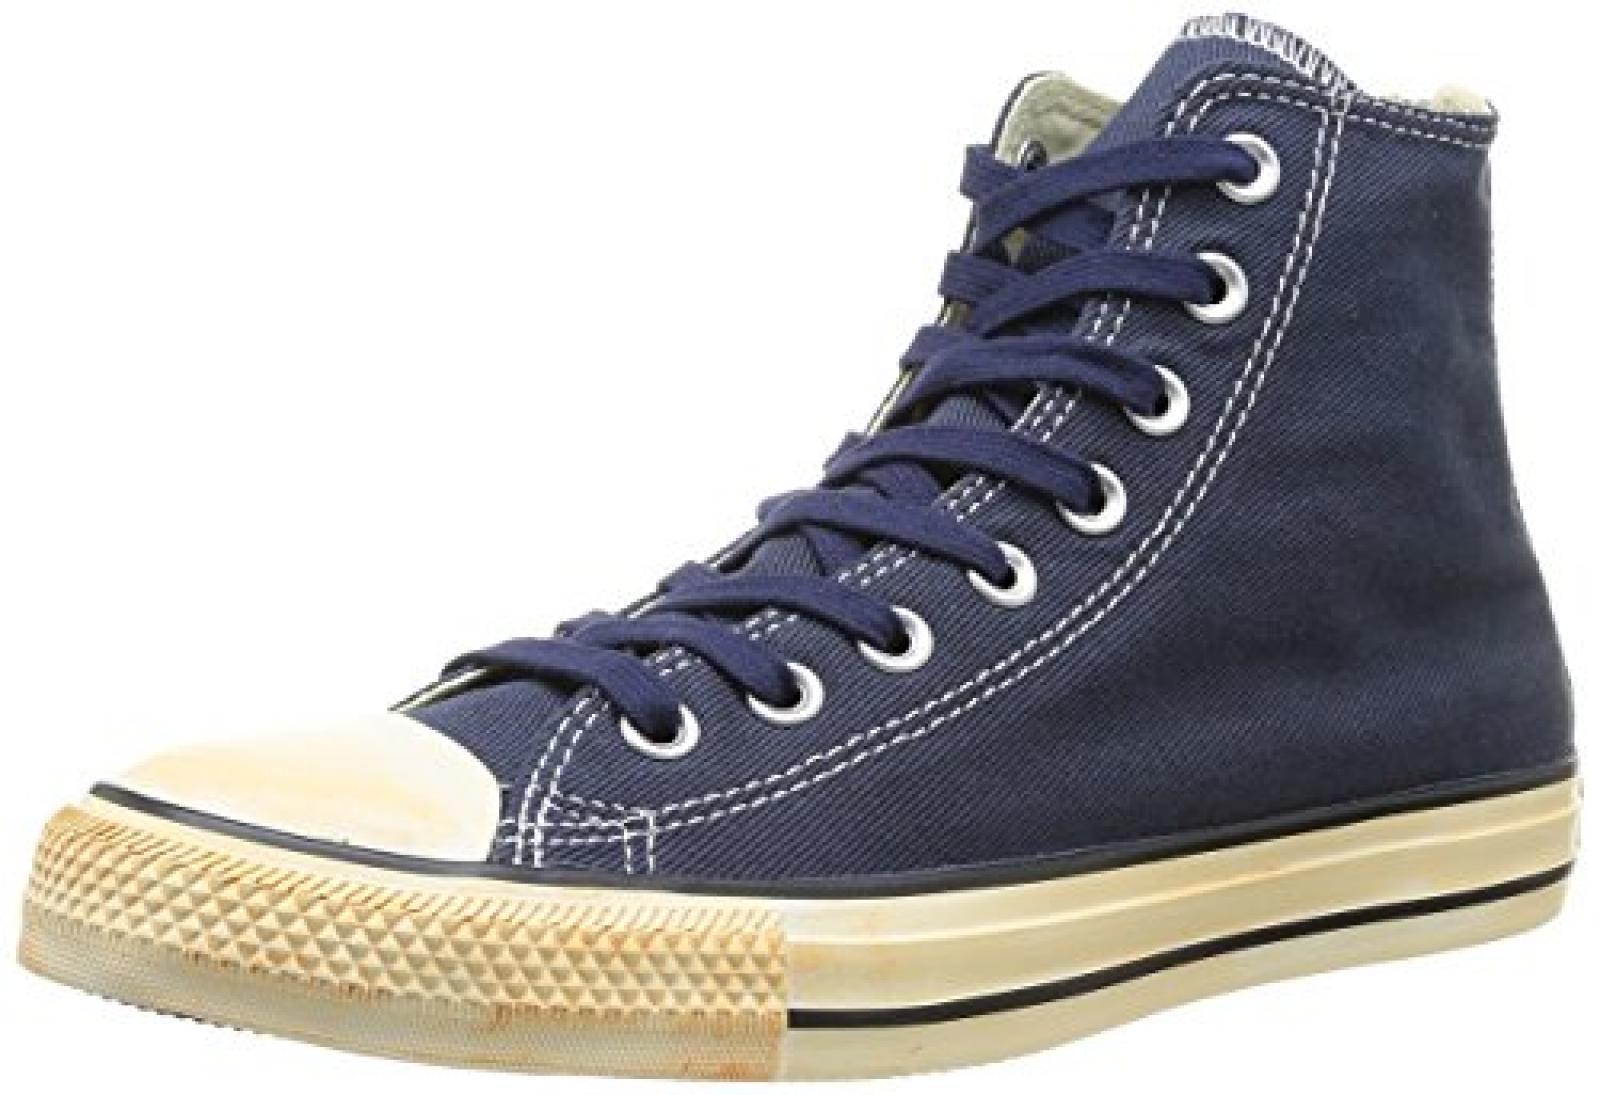 Converse Chuck Taylor All Star Homme Vintage Washed Back Zip Twill Hi 381790 Herren Sneaker